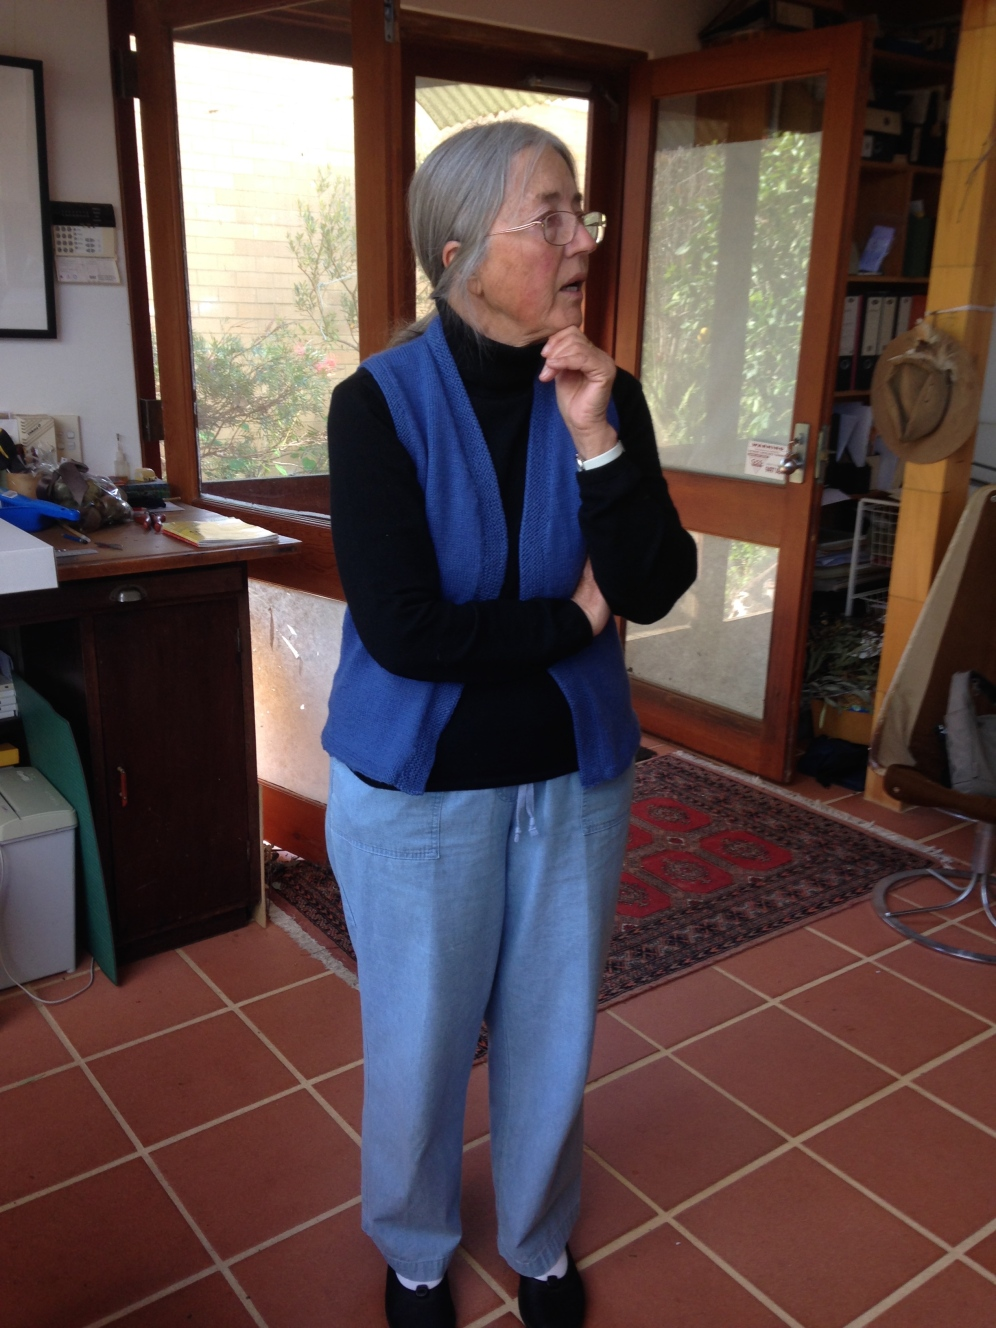 A visit to Philippa Nikulinsky's home studio located in Gayl's neighborhood.